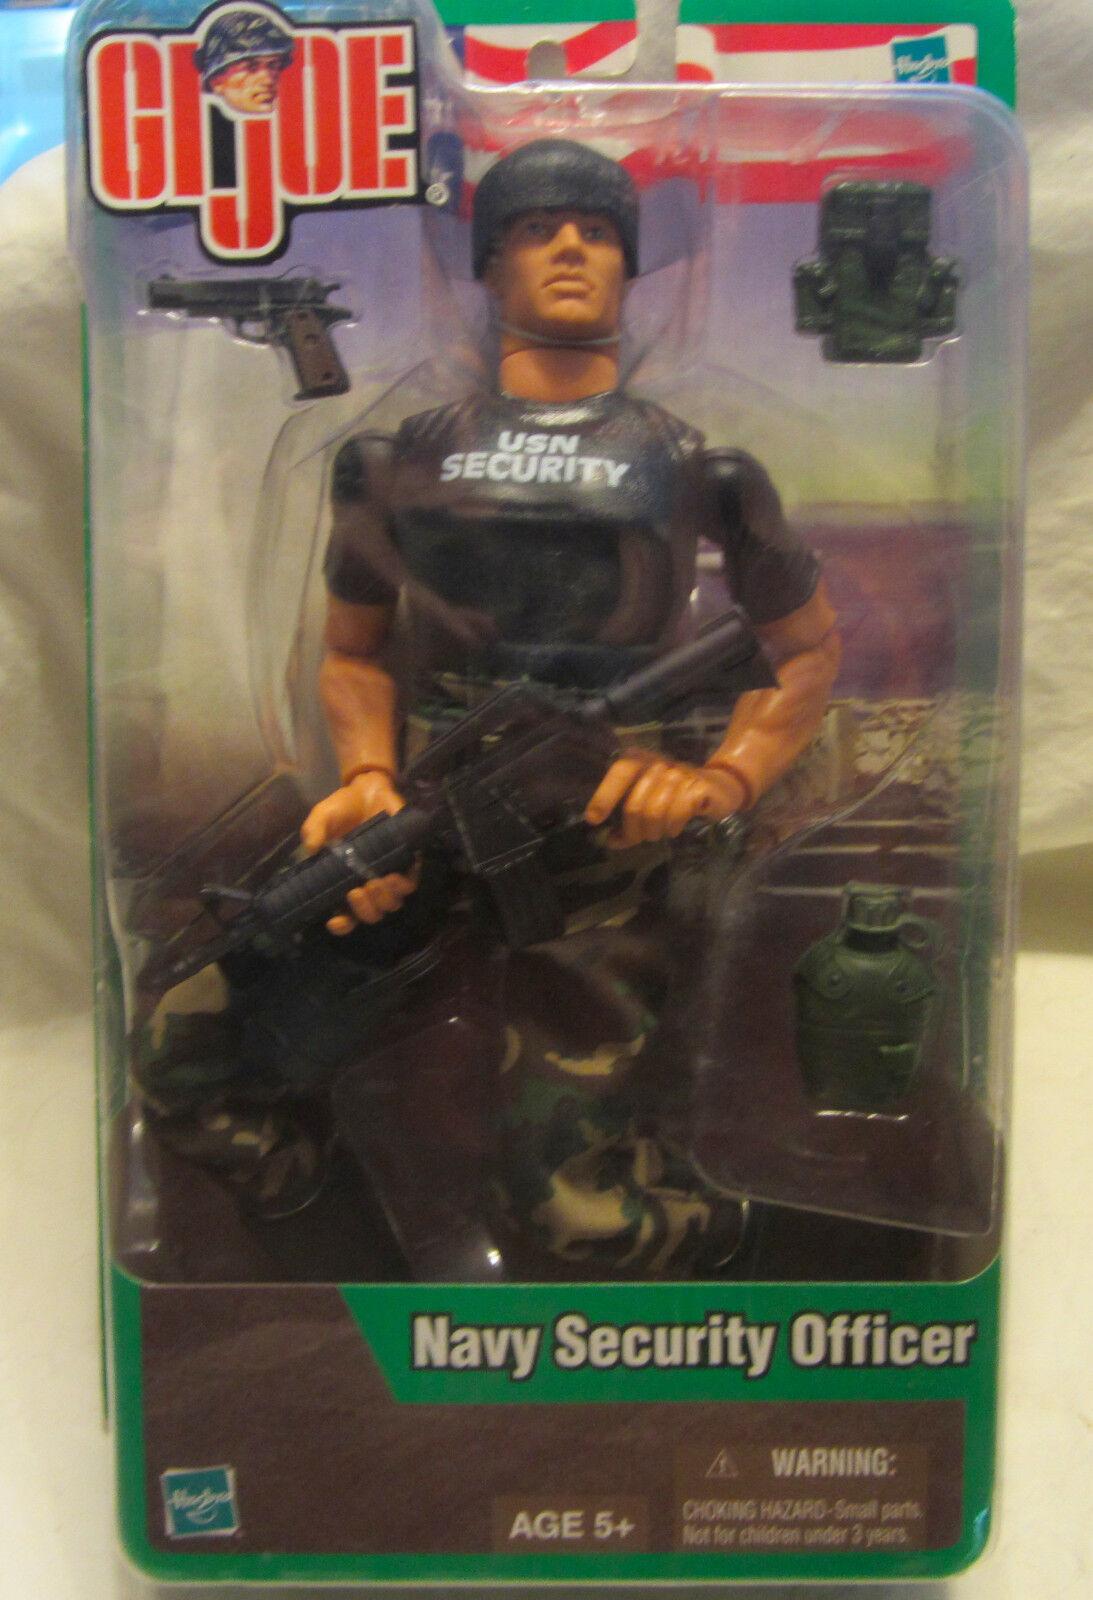 Gi - joe - security officer 12  action - figur 2003 hasbro neue